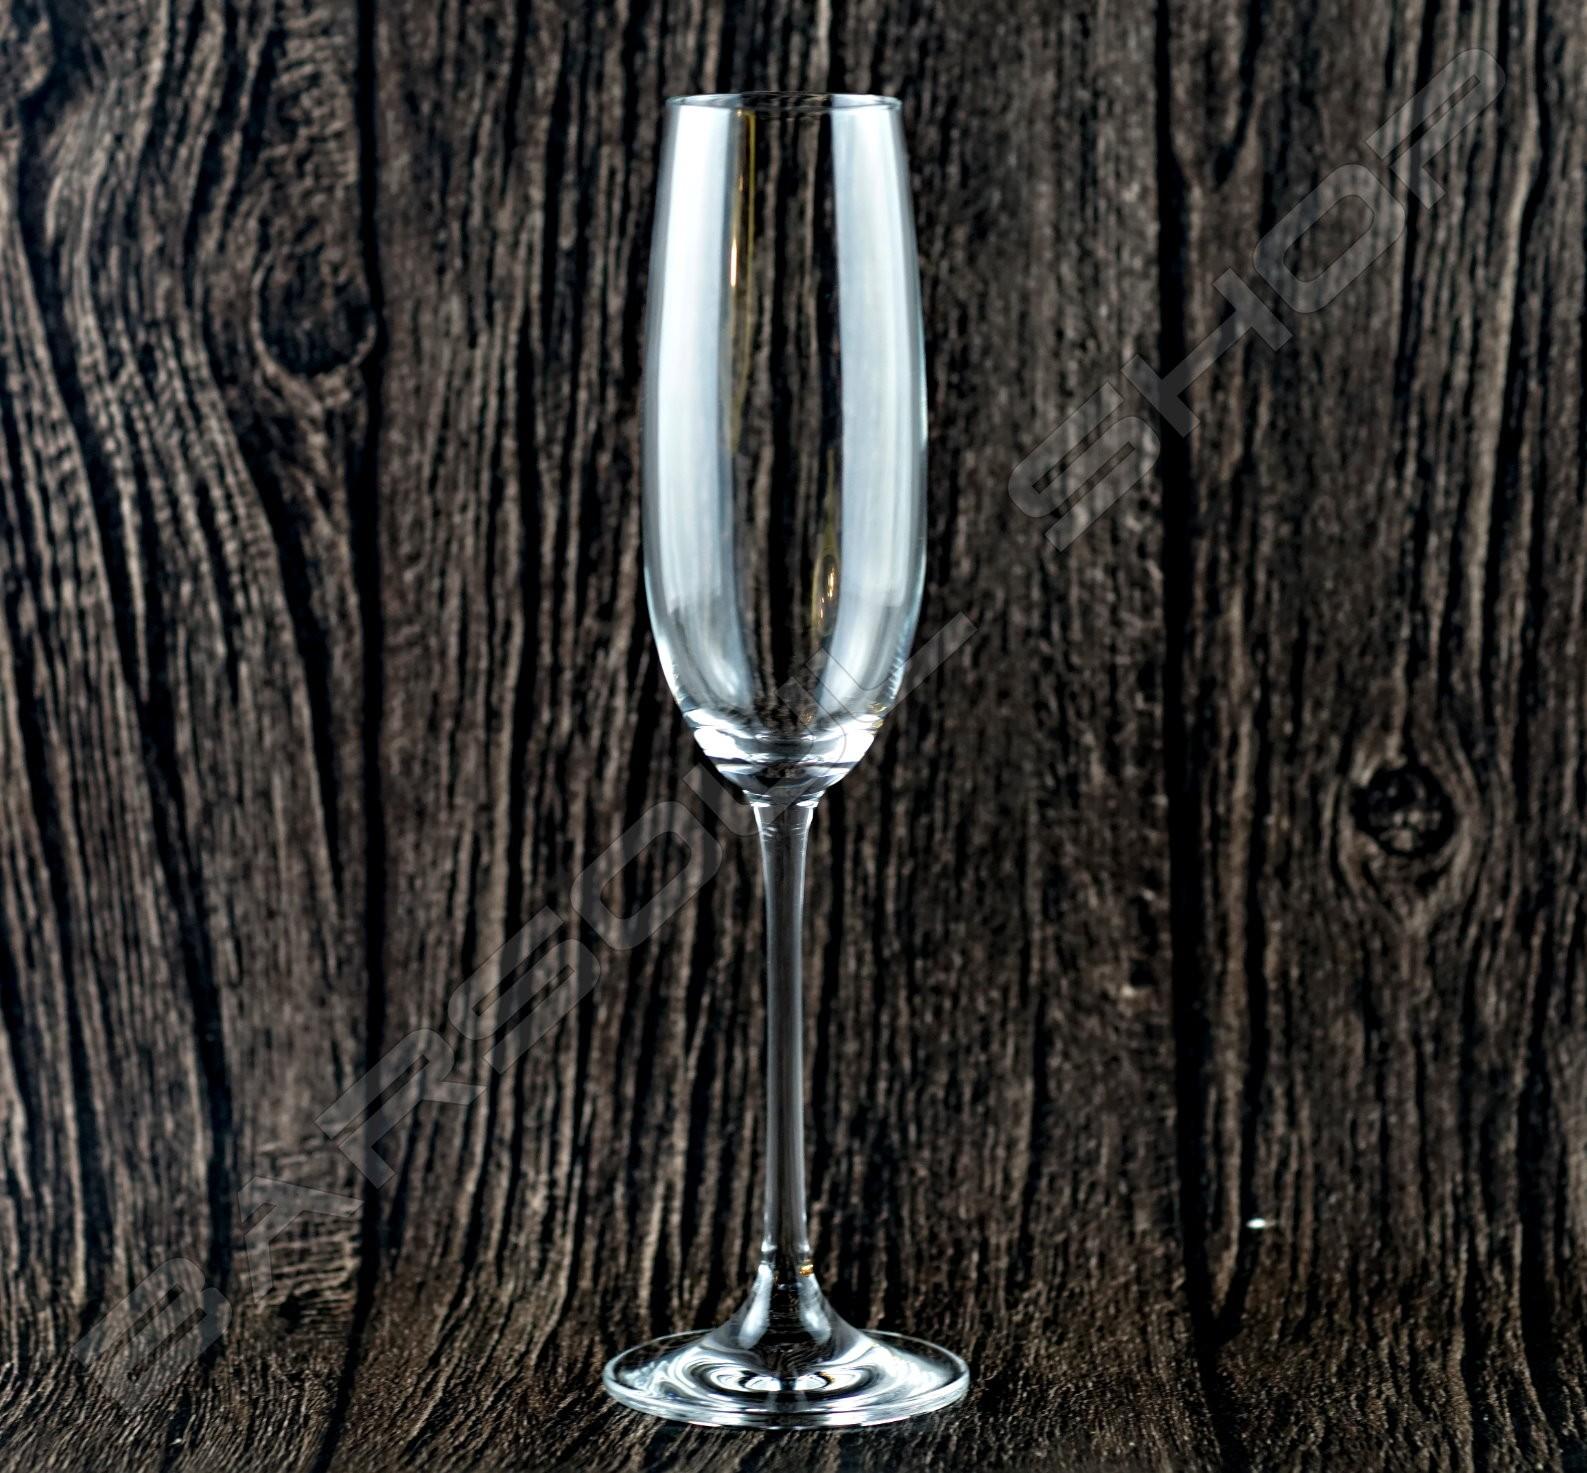 【預購】德國傳統香檳杯(A)240ml 12PCS Germany SPIEGELAU Champagne Glass